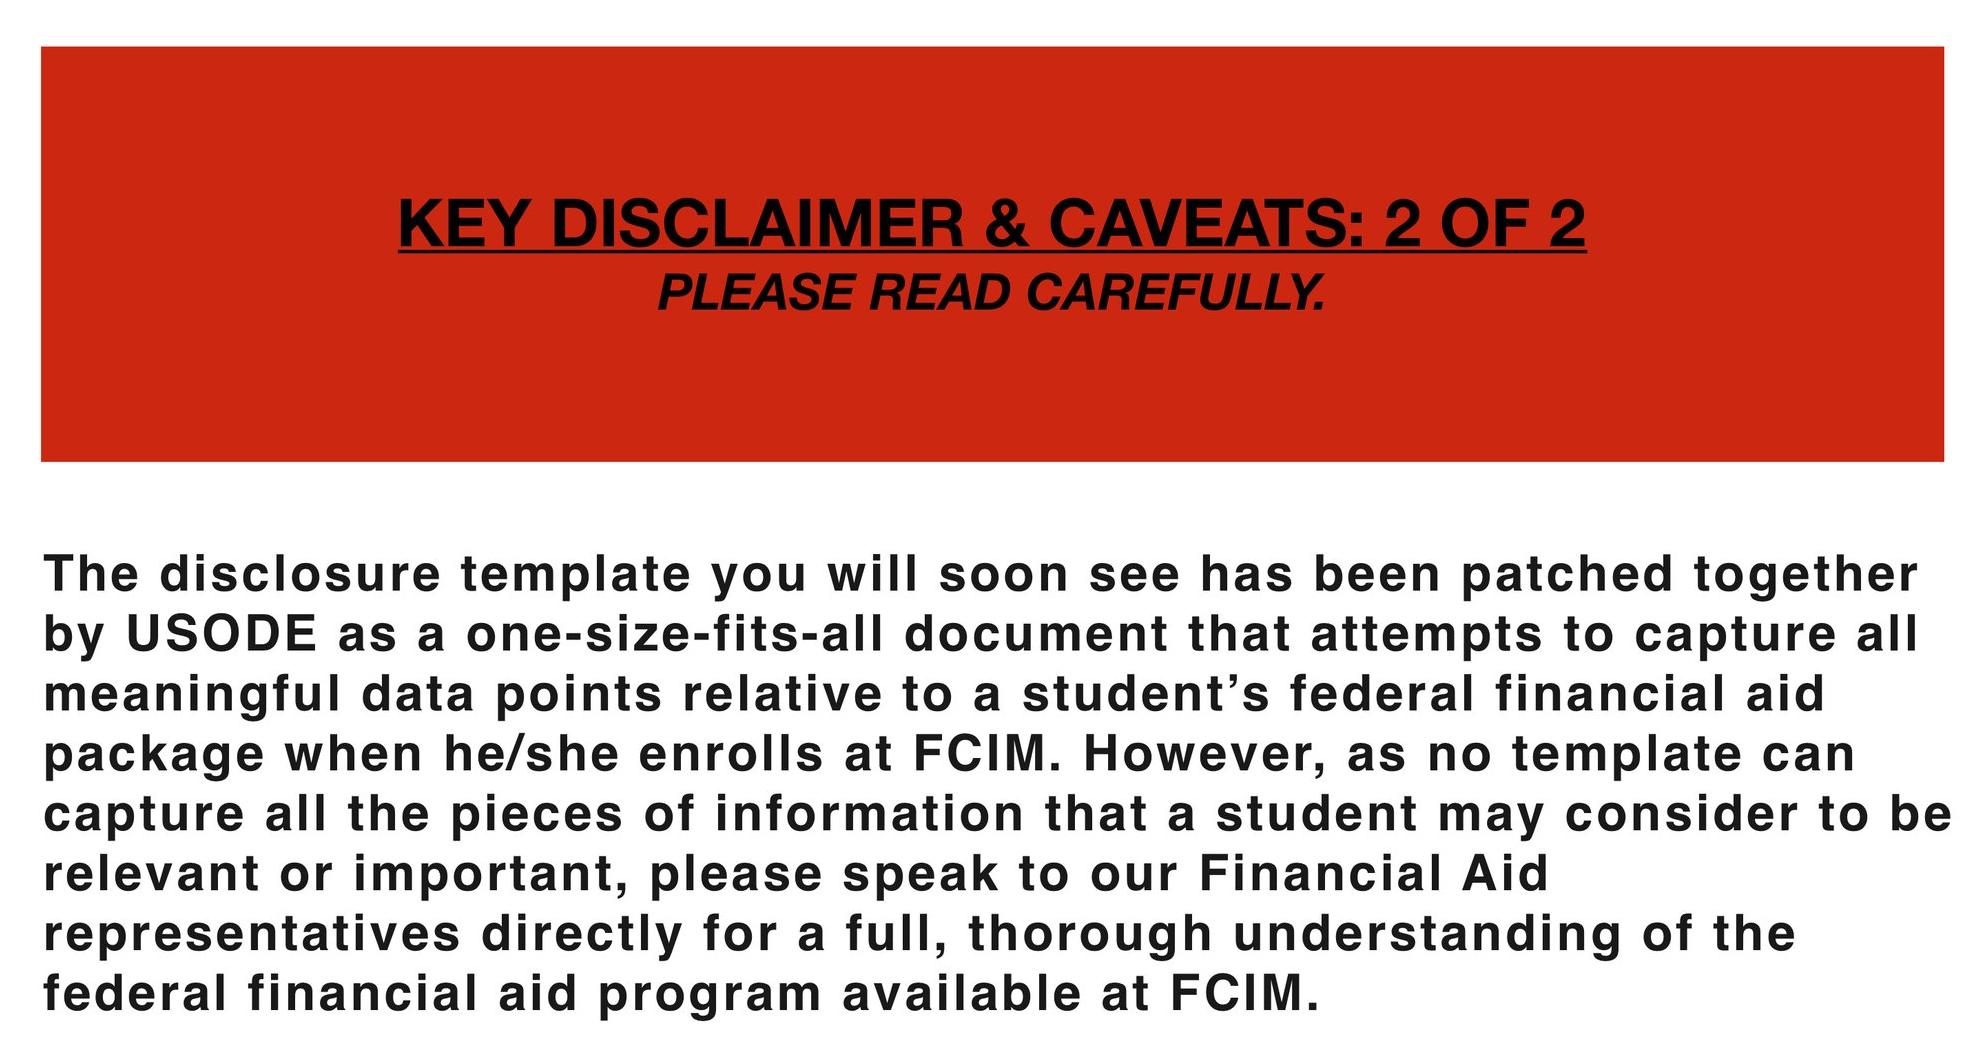 GE Disclaimer & caveats 2 of 2.jpg